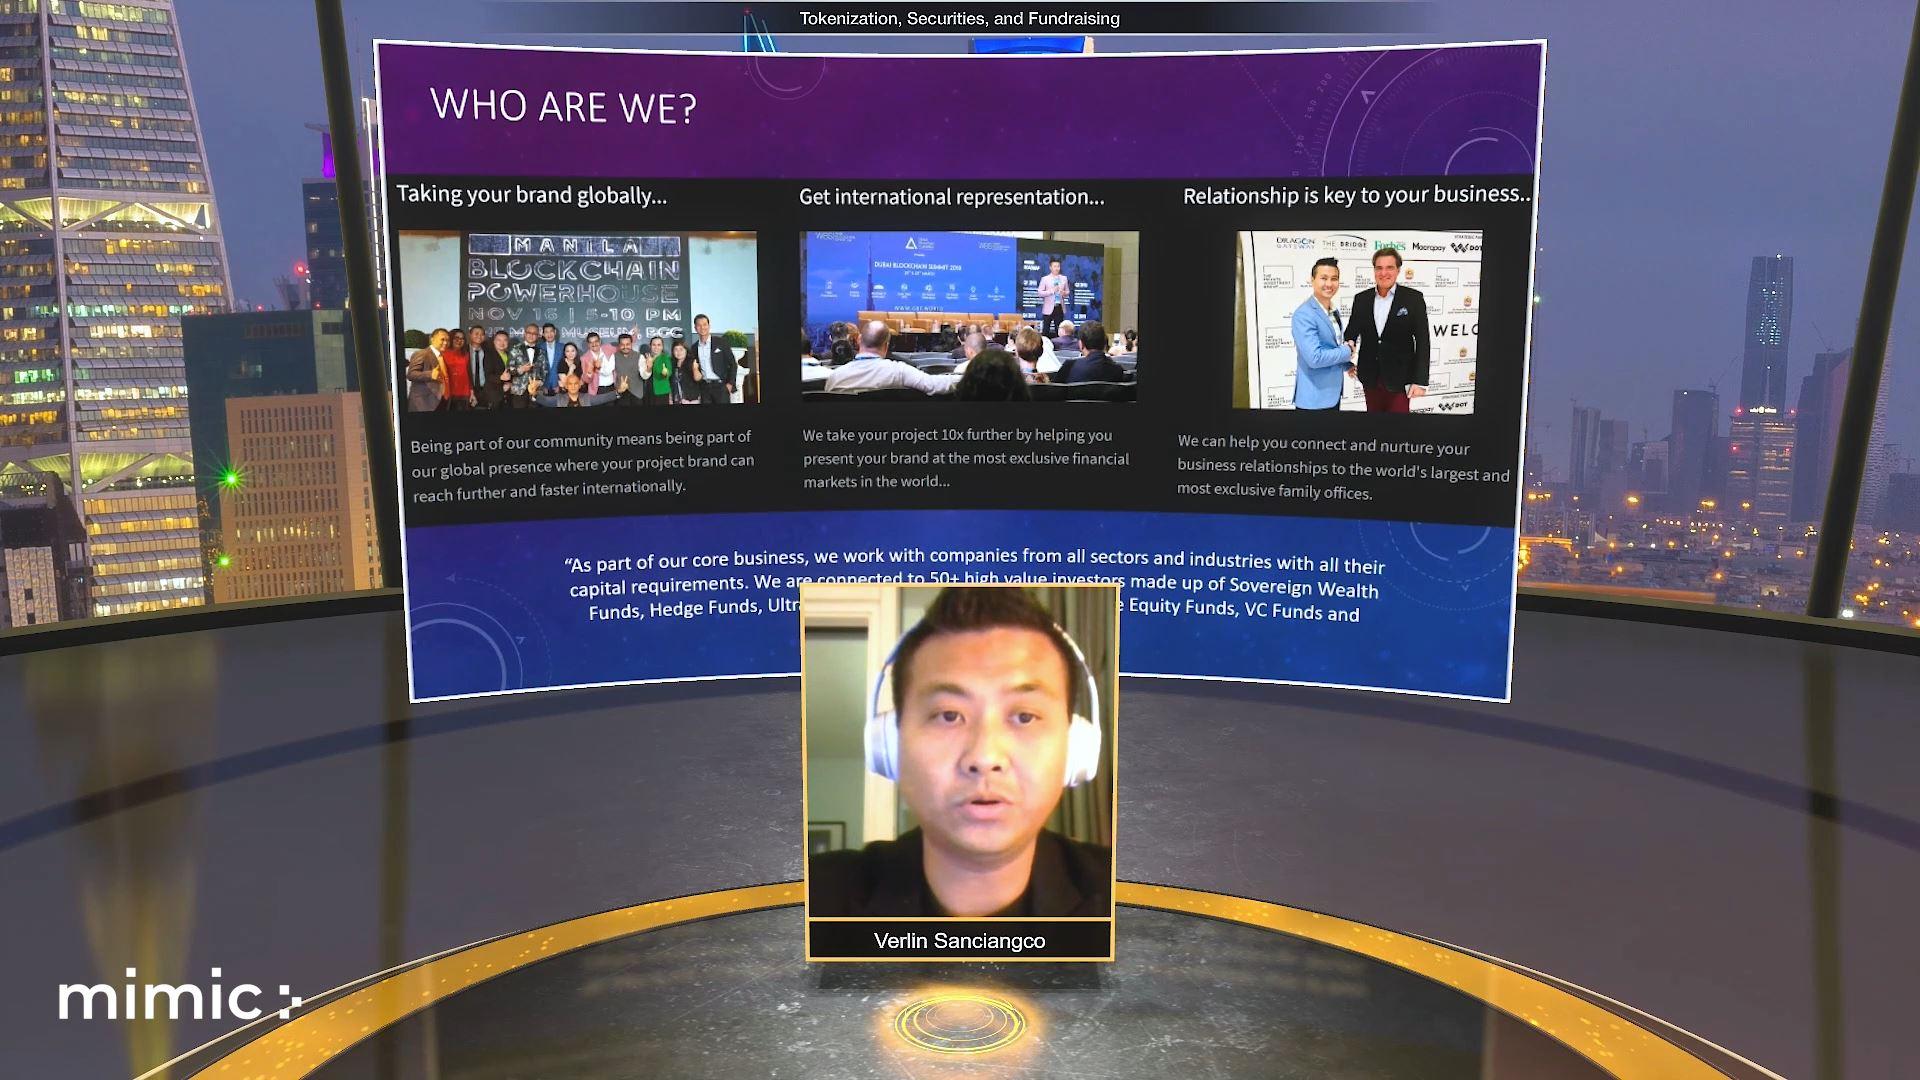 melecoin blockchain technology virtual event speaker with screen